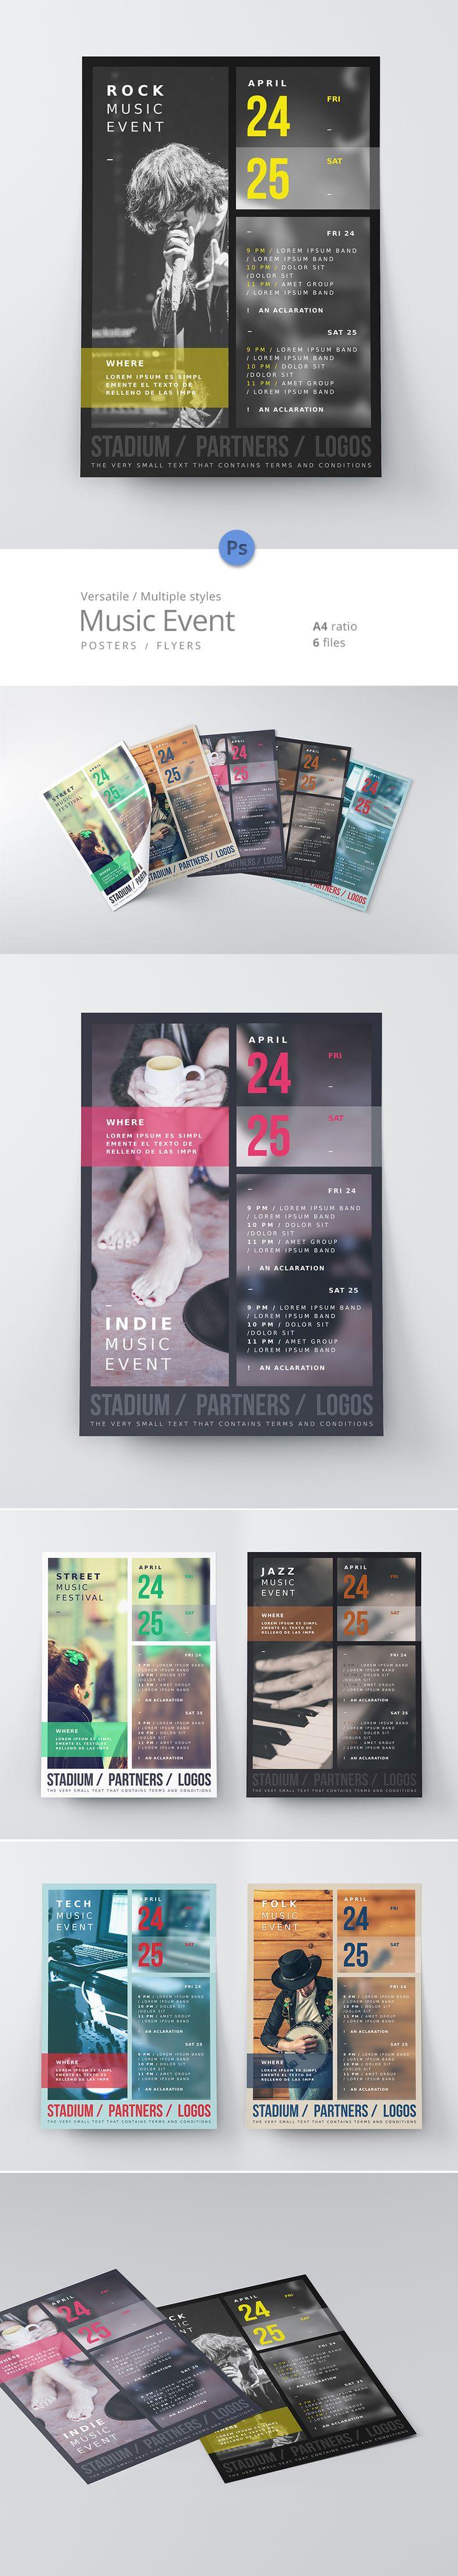 Poster design online free download - Download